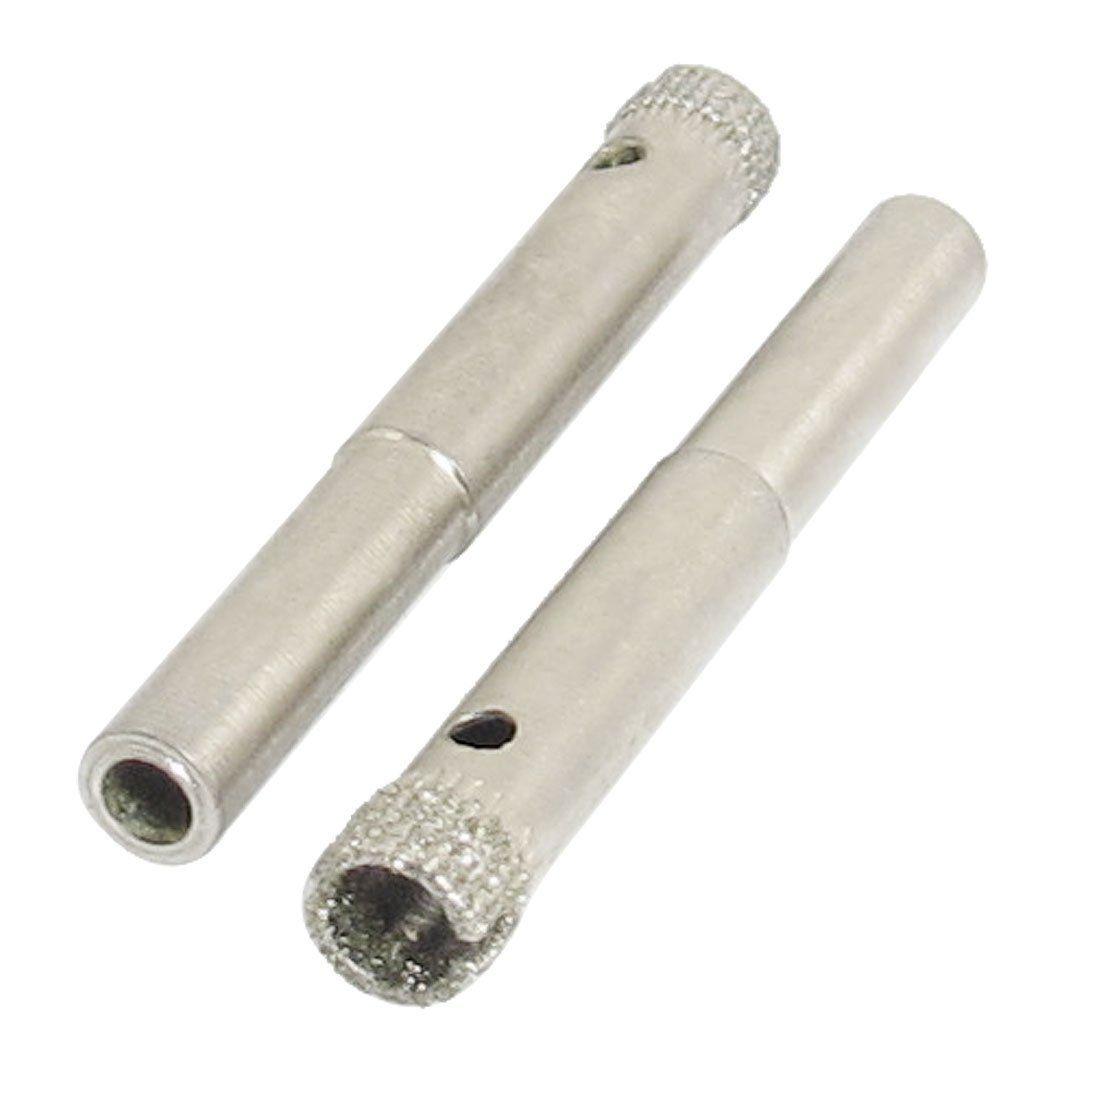 Diamond Coated Core Hole Saw Drill Bit Set Tools For Tiles Marble Glass 7mm 3 11 2pcs Drill Bits Glass Tile Ceramic Tiles